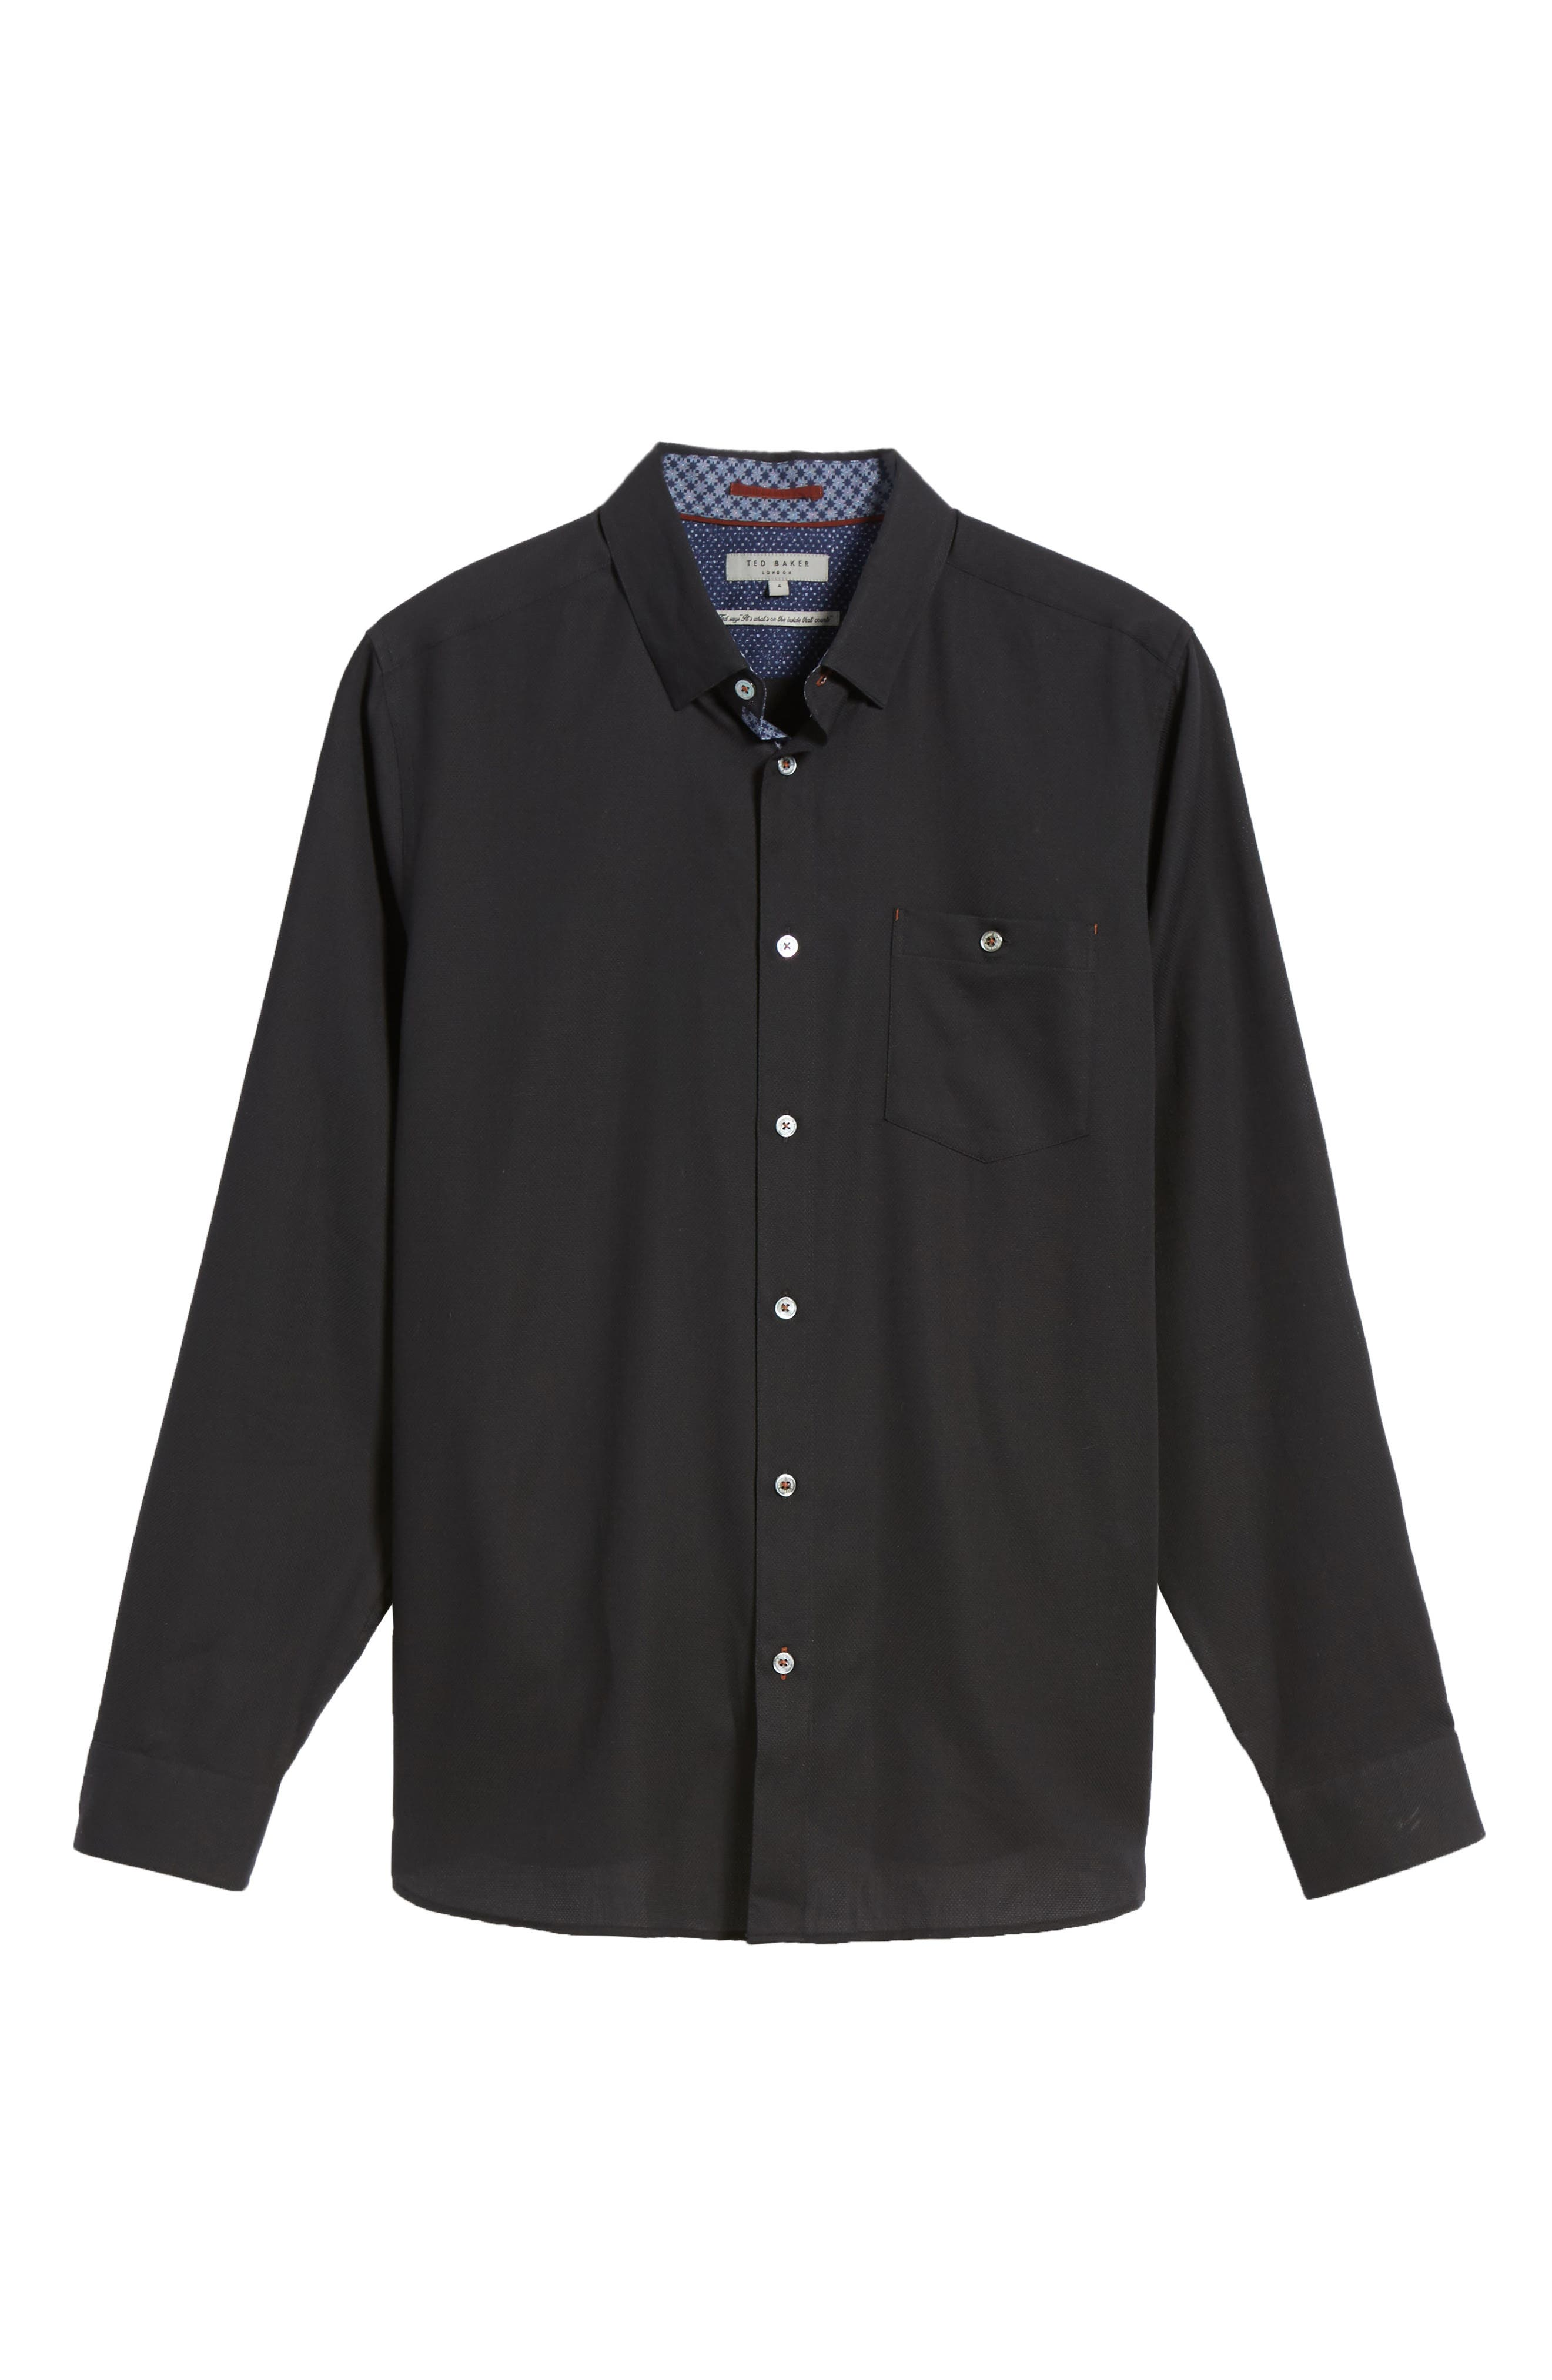 Nordlux Modern Slim Fit Stretch Cotton Sport Shirt,                             Alternate thumbnail 6, color,                             001